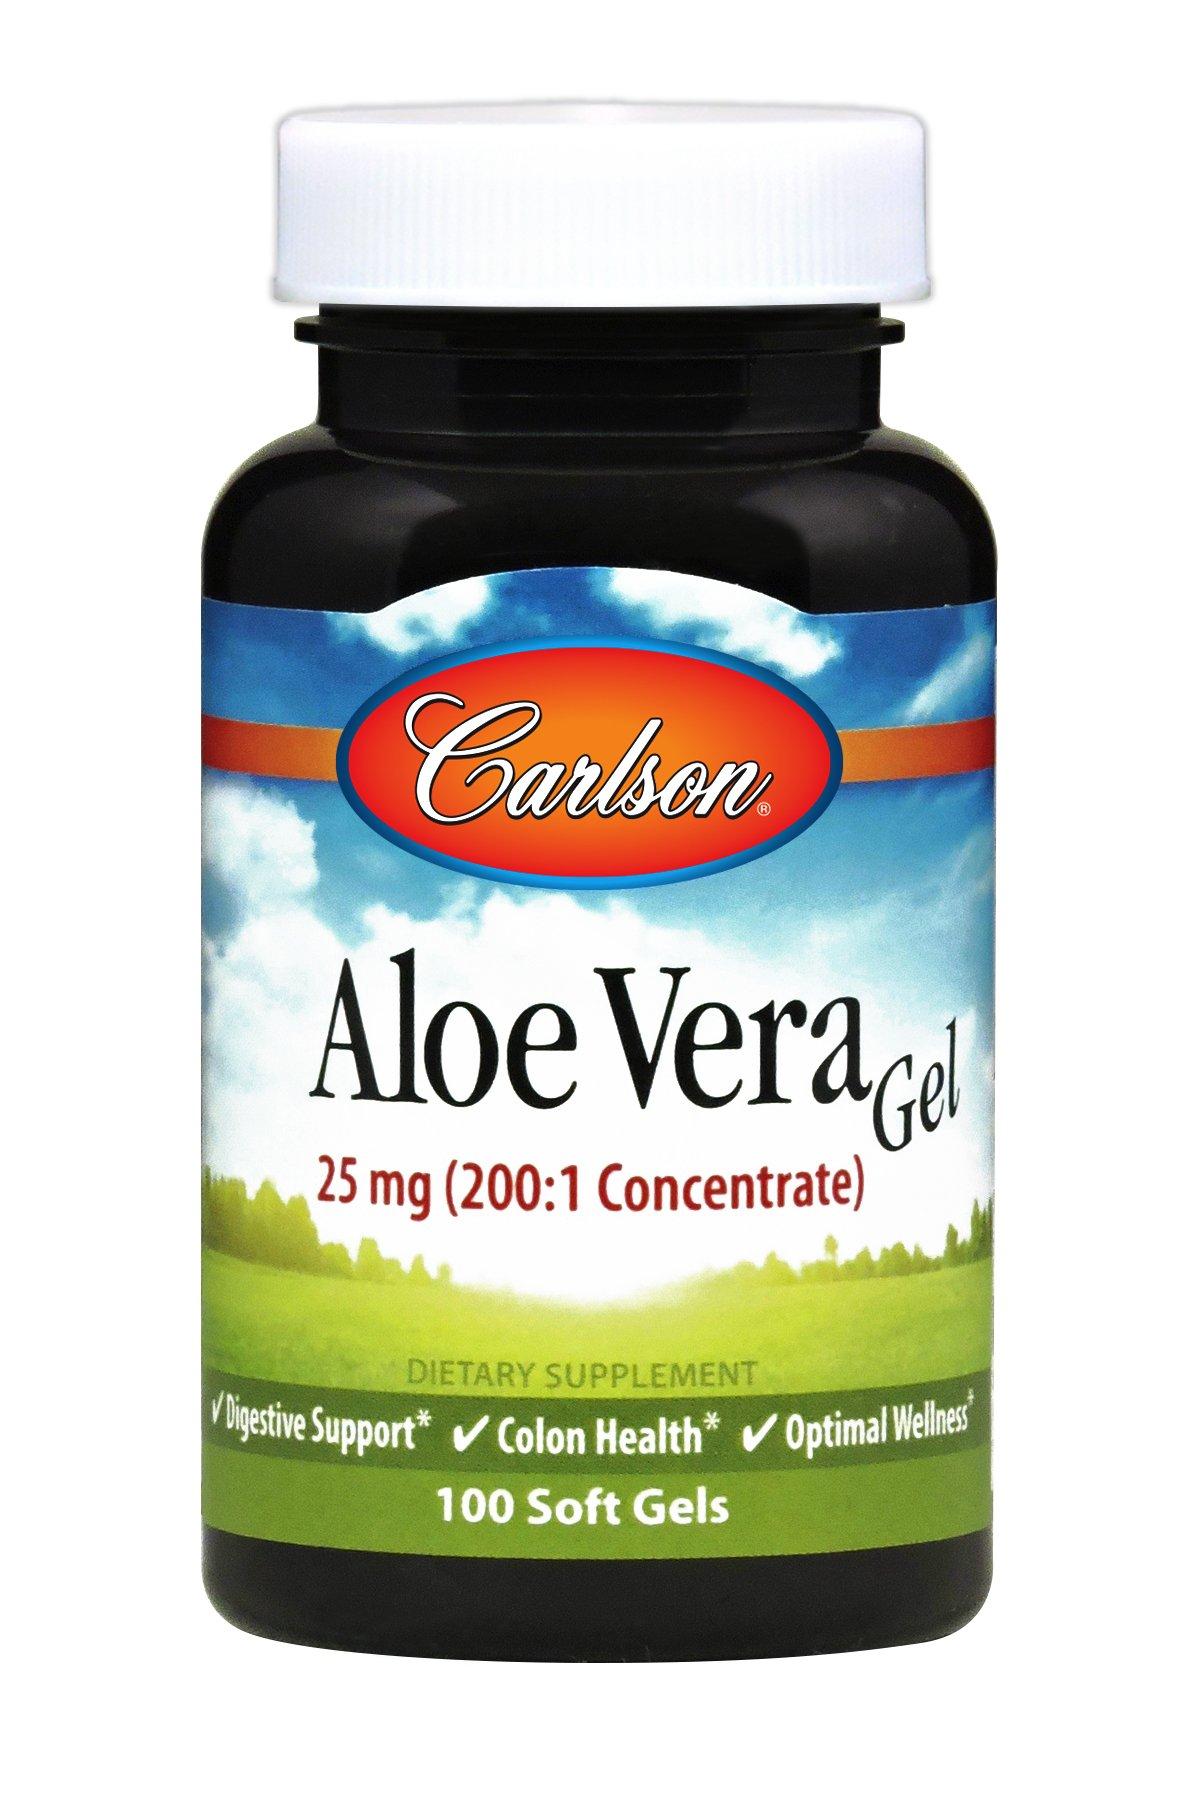 Carlson Aloe Vera Gel 25 mg, 200 to 1 Equivalent to 5,000 mg, 100 Soft Gels